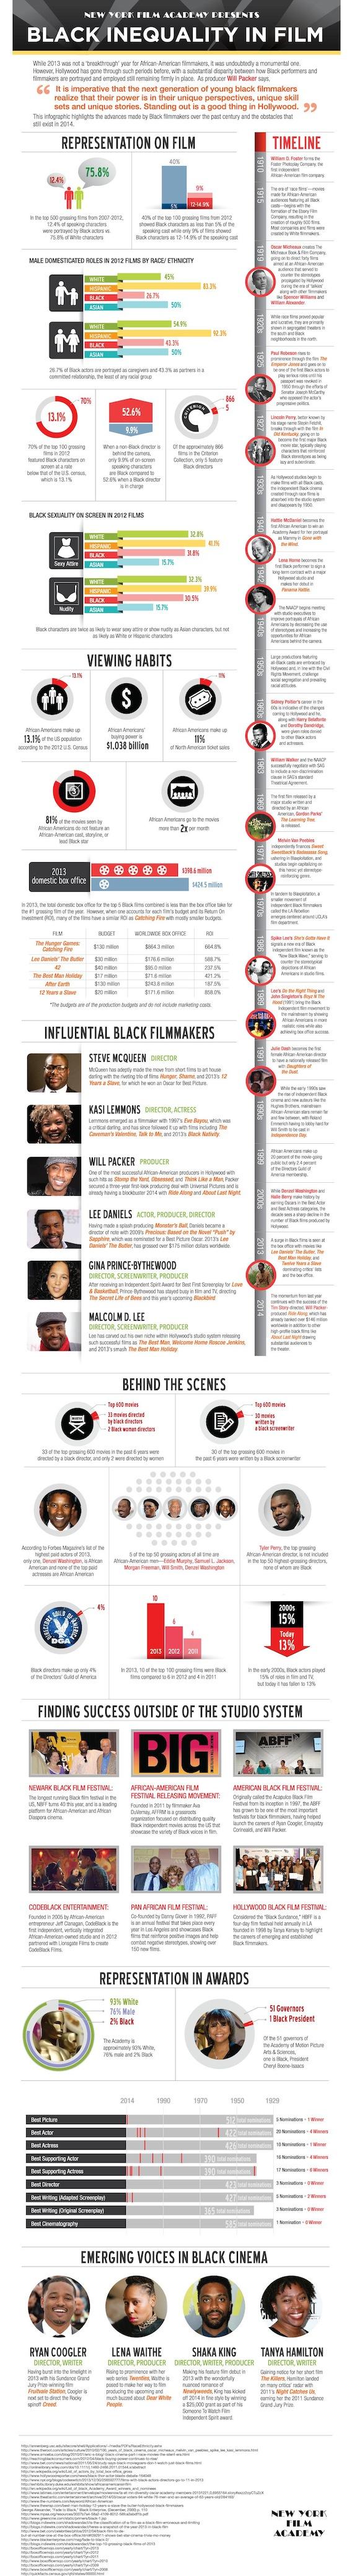 Black Inequality in Film